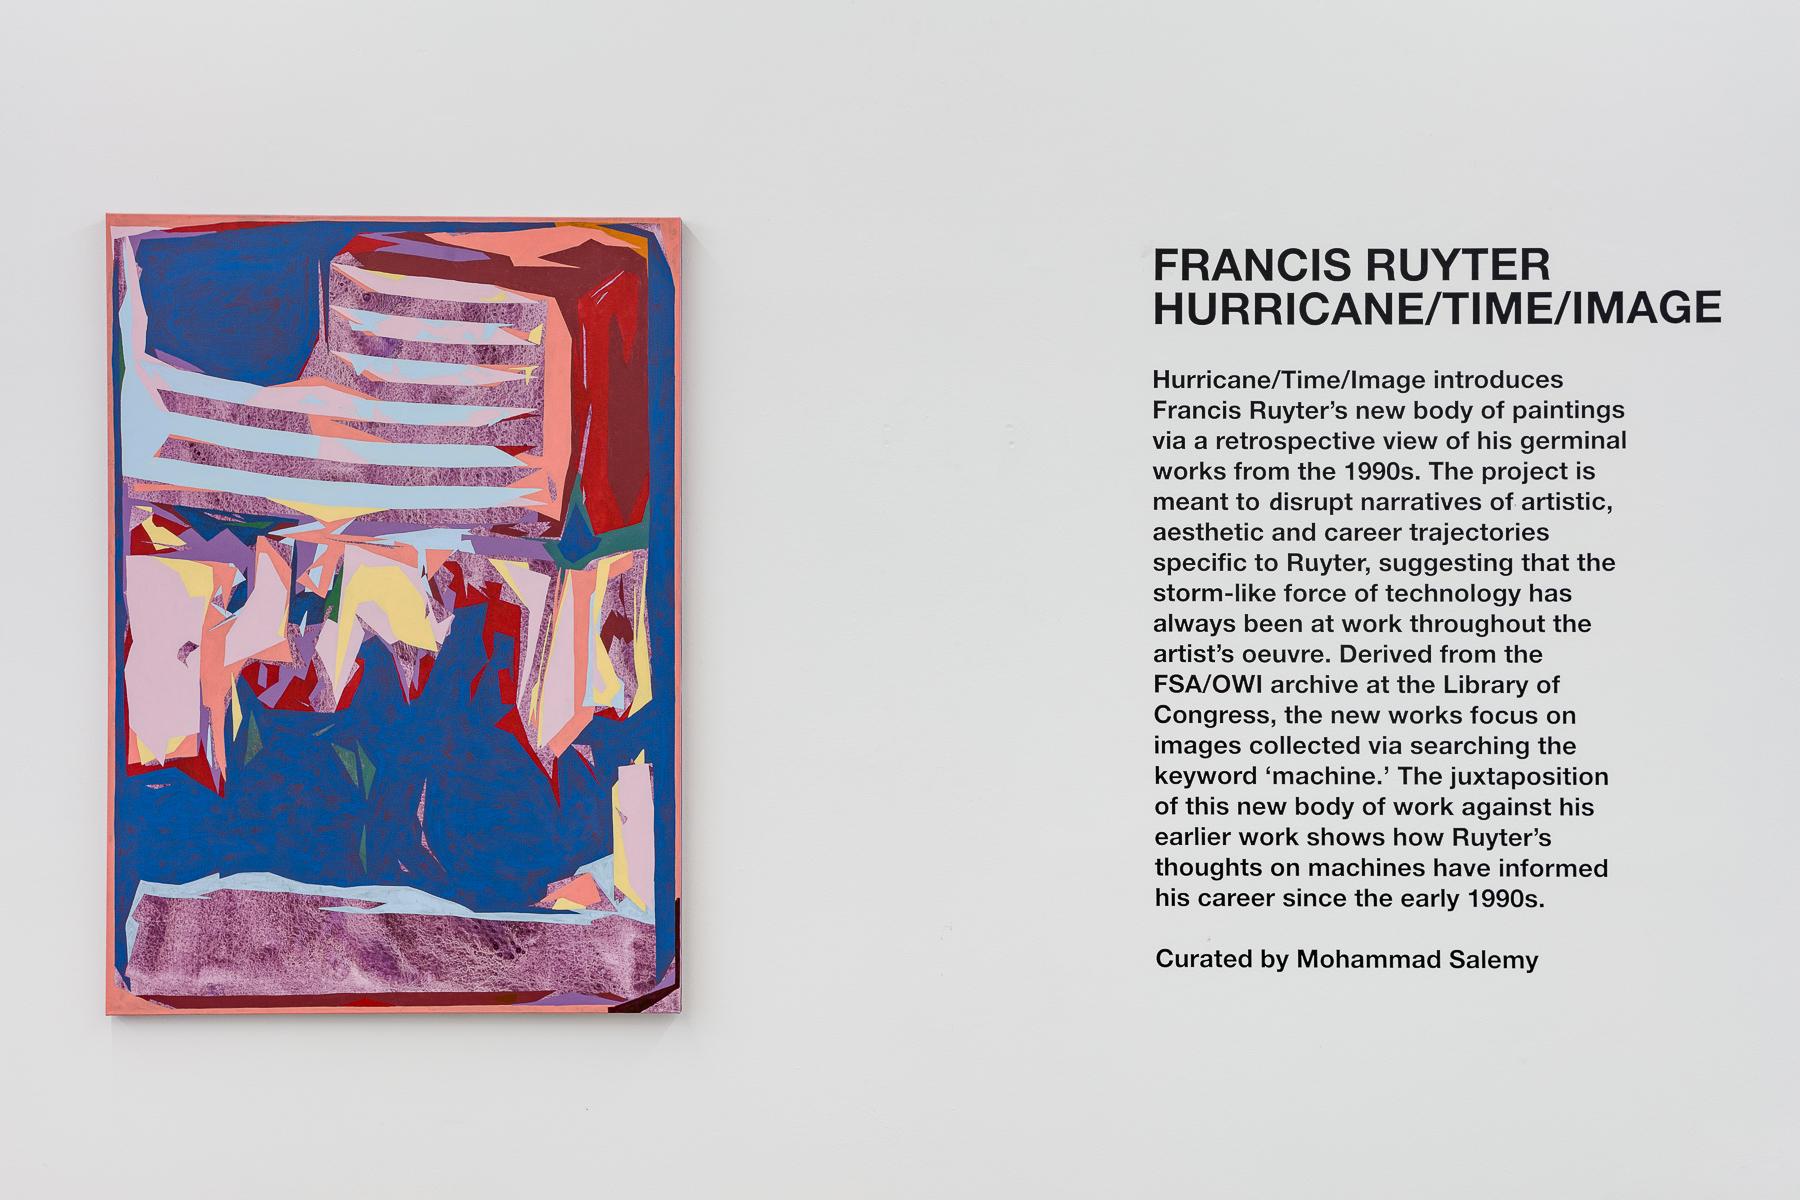 2019_04_Ausstellungsansichten_Francis-Ruyter_hurricane-time-image_010_web.jpg